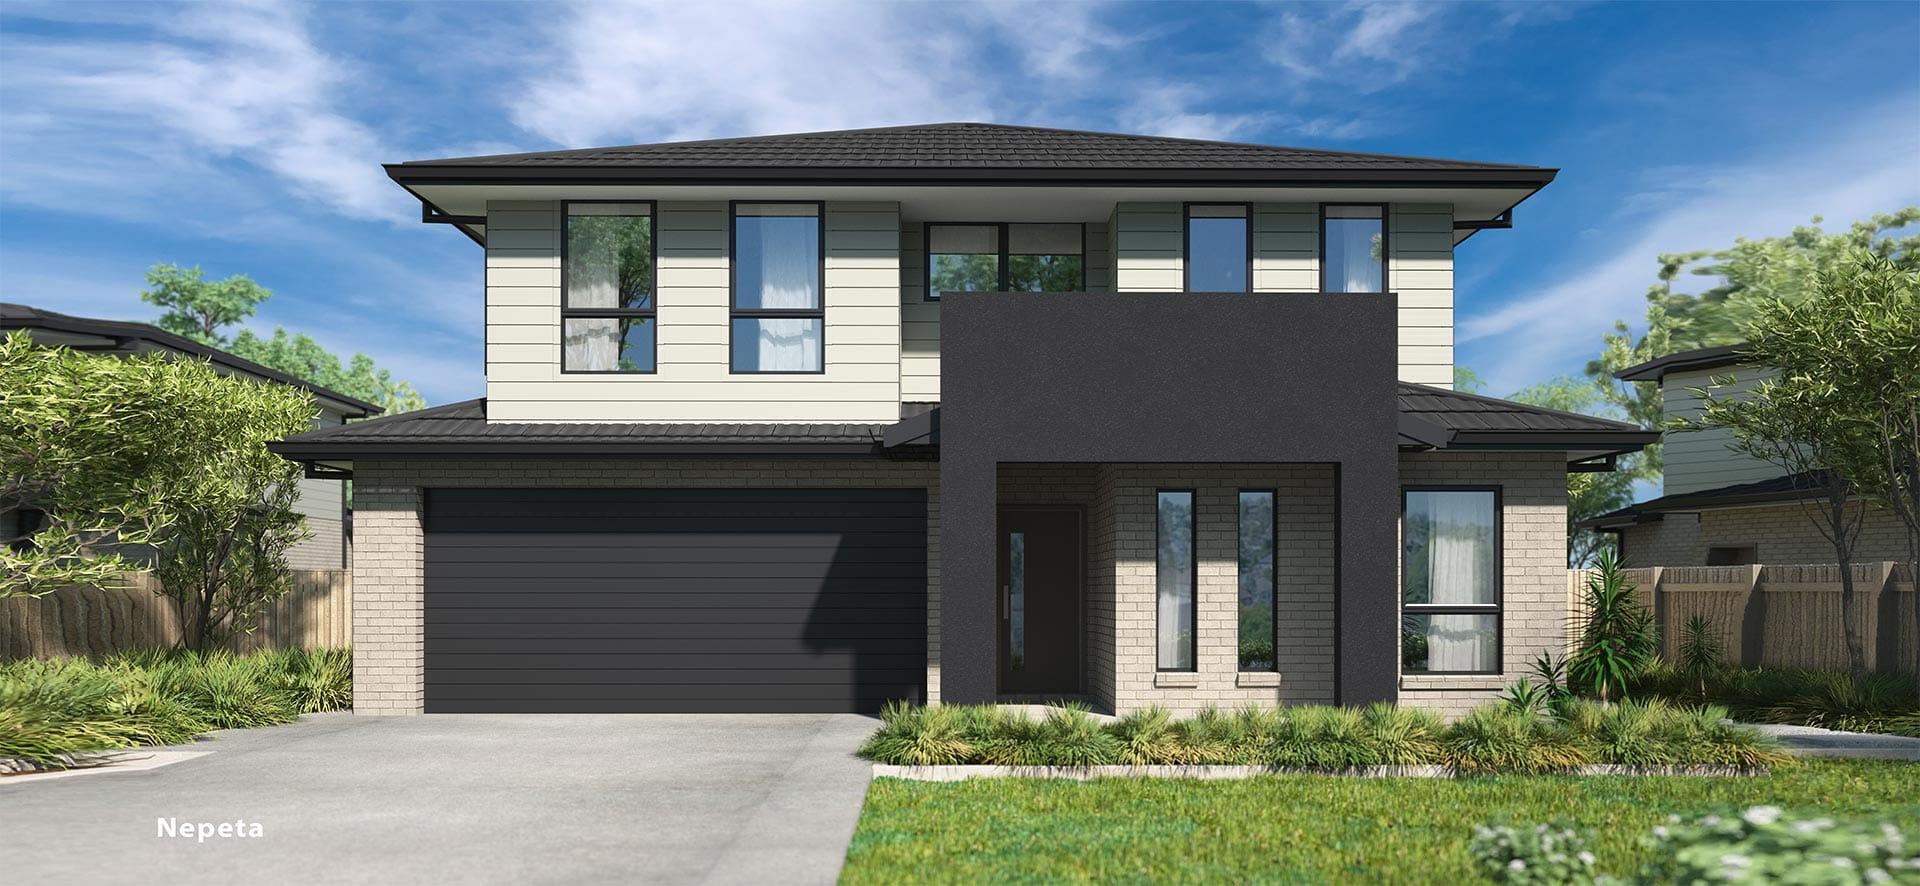 Nepeta Double House Design